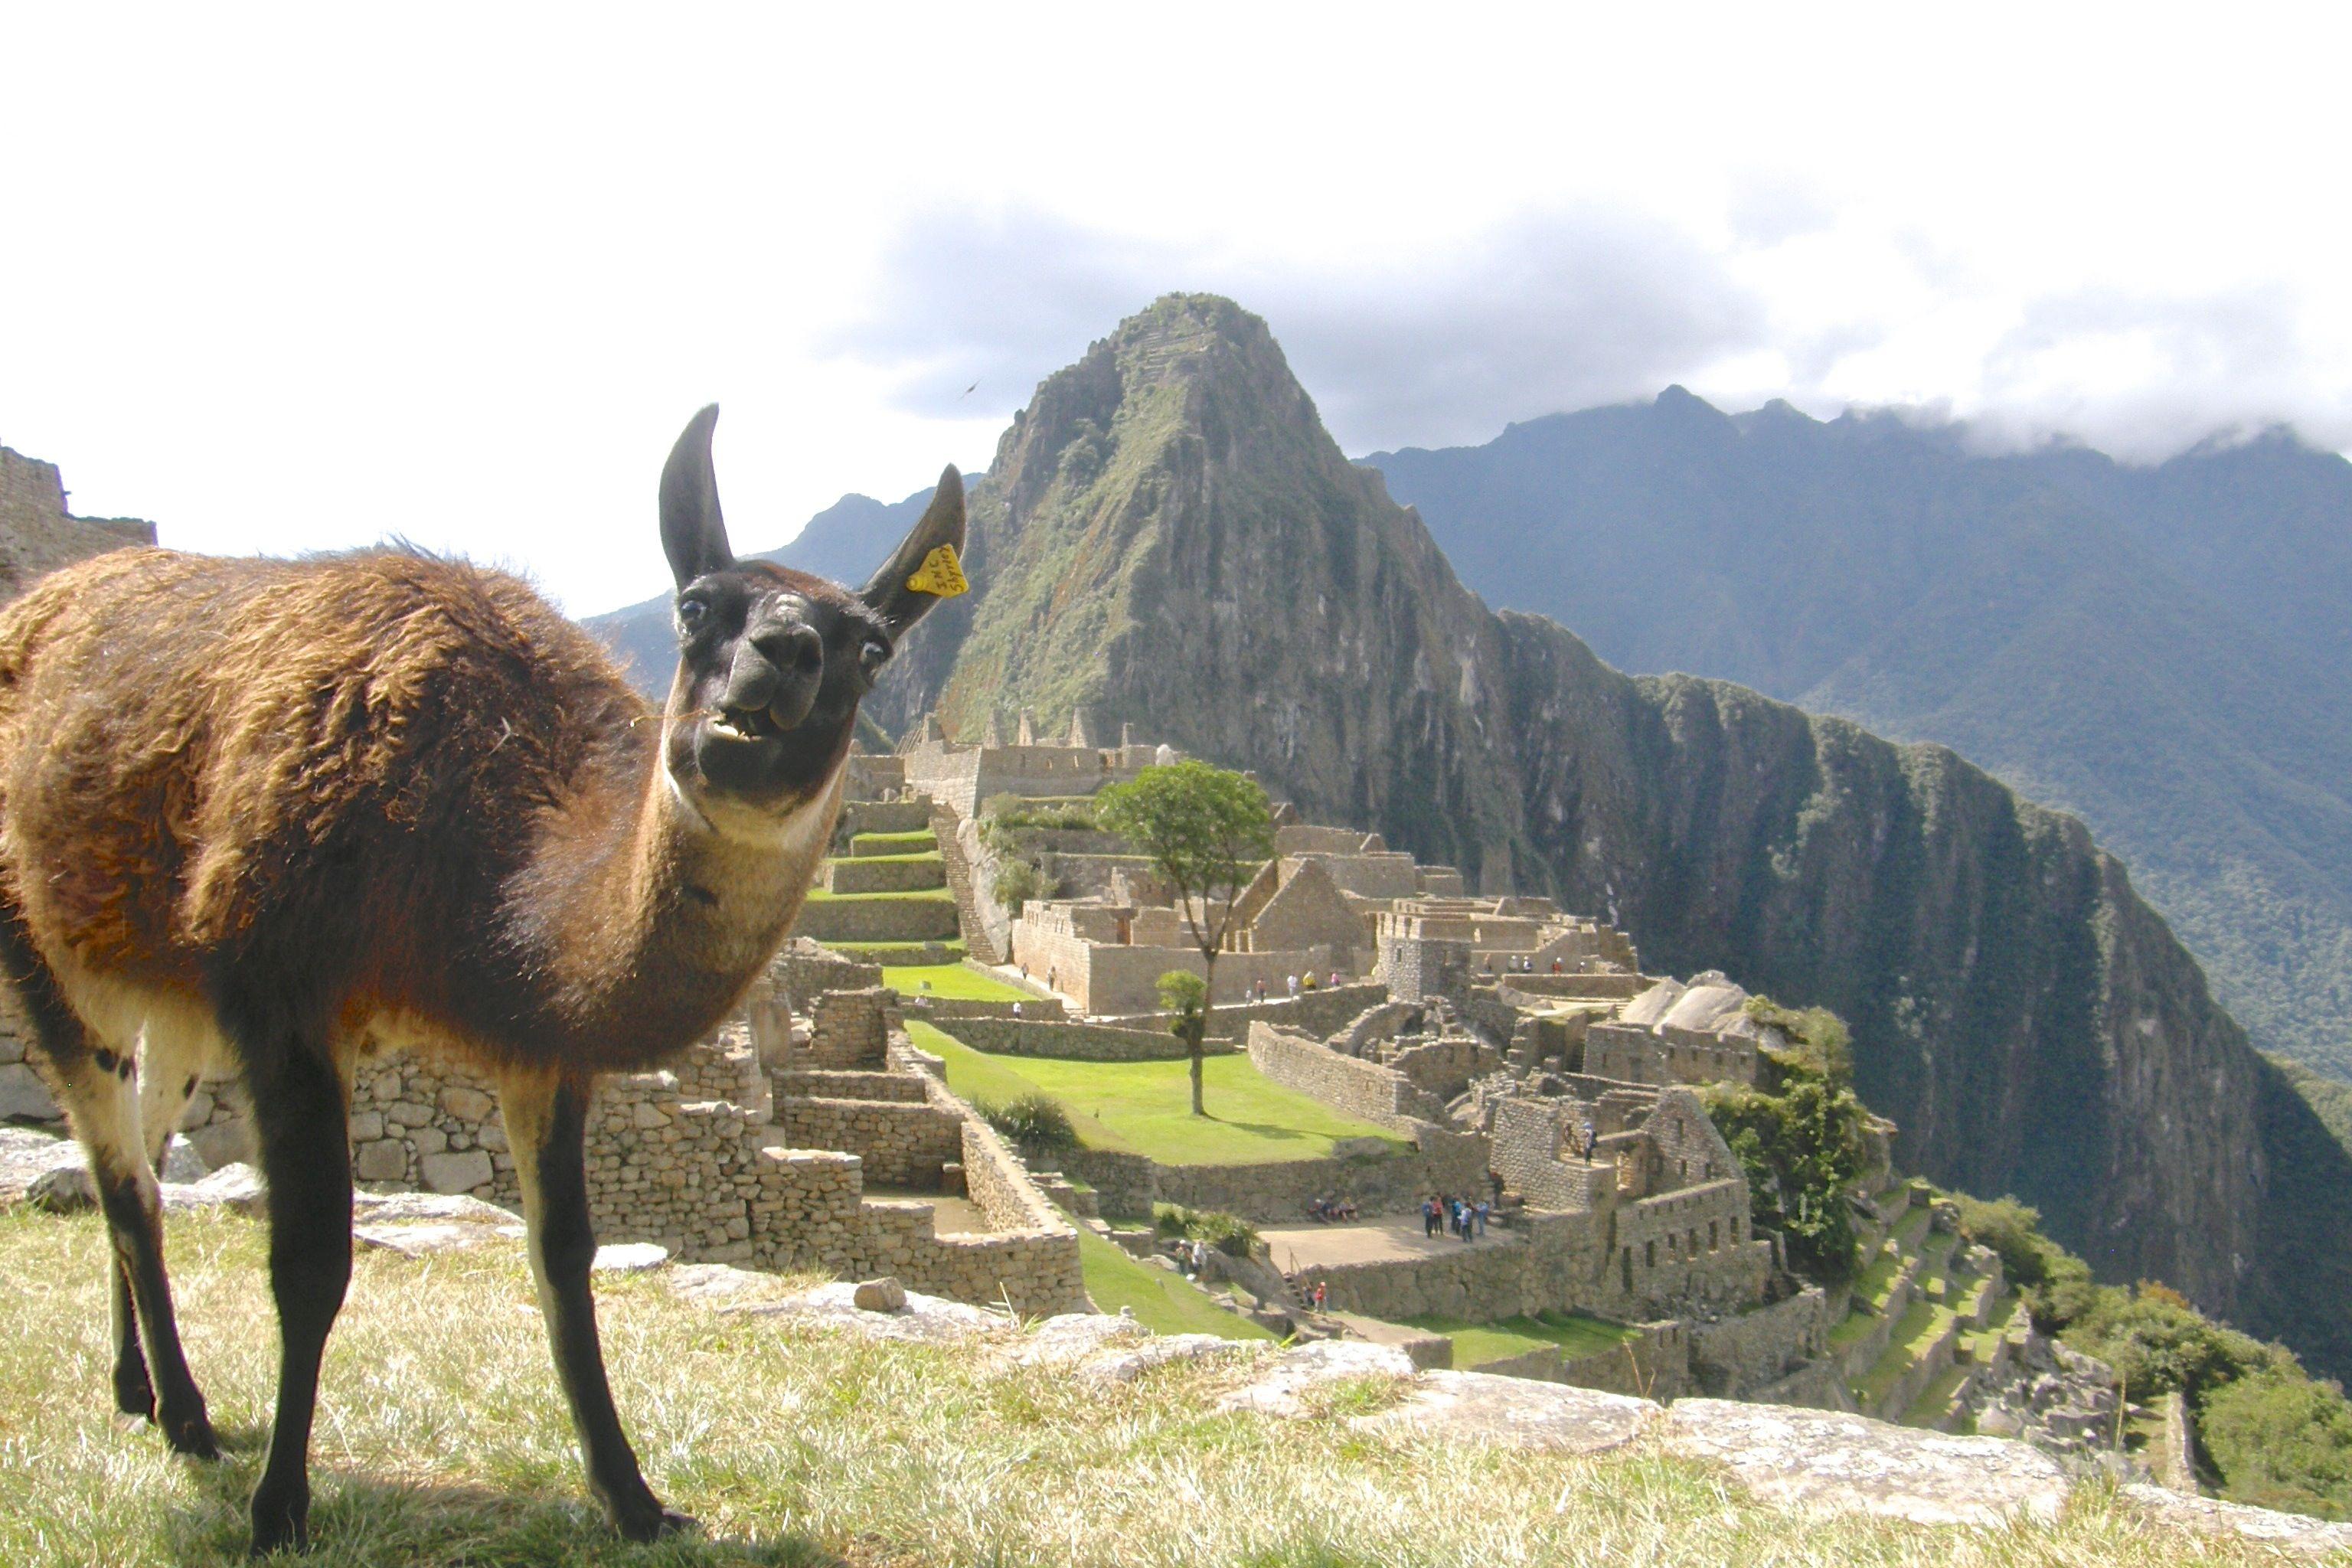 Amazing Llama Photobomb At Machu Picchu (PICTURE)